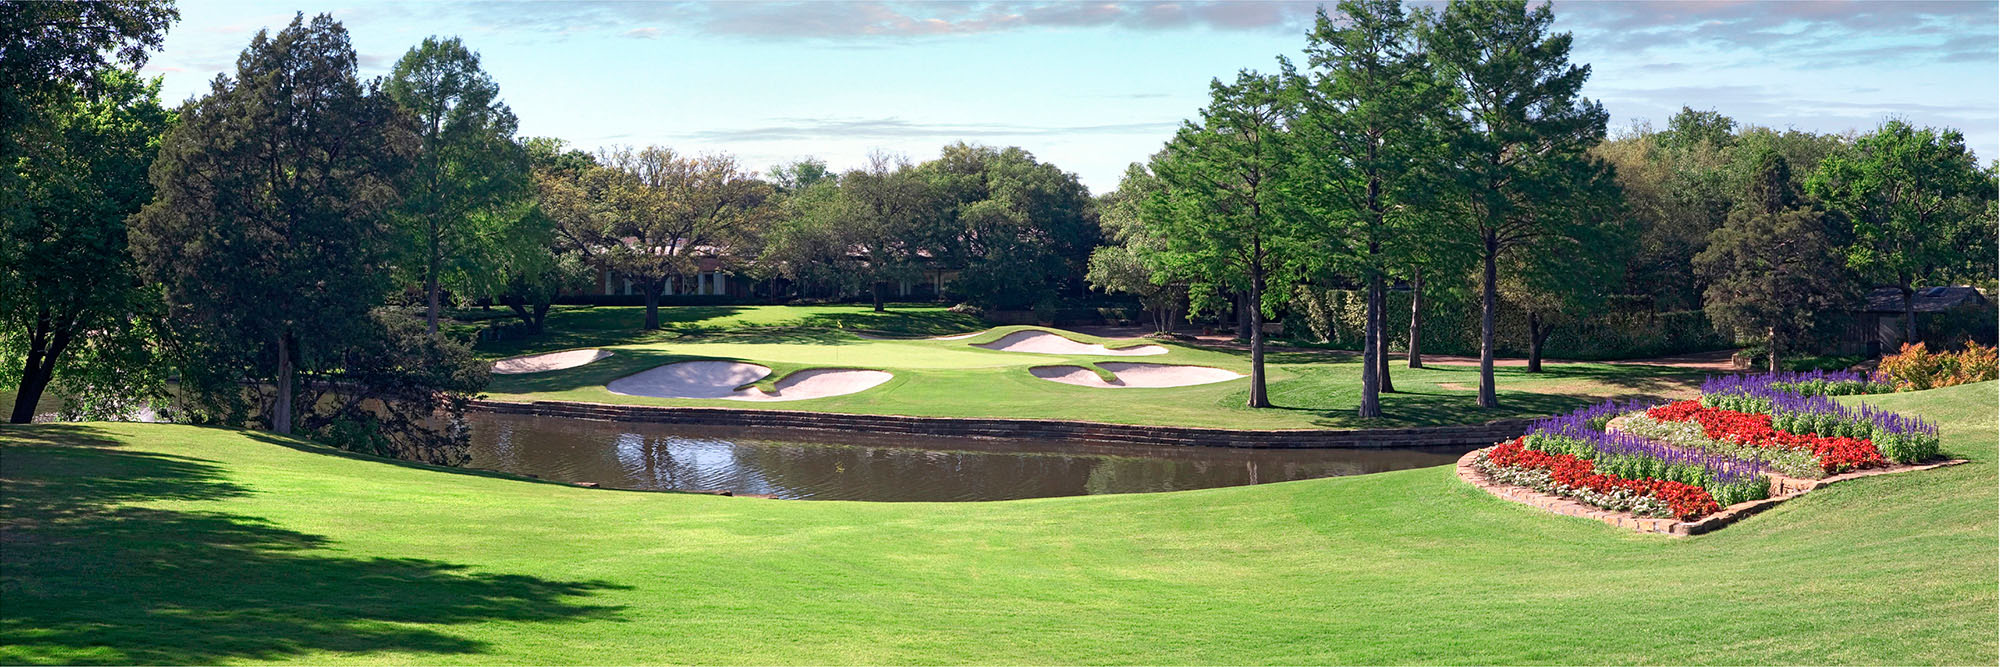 Golf Course Image - Dallas Country Club, No. 15